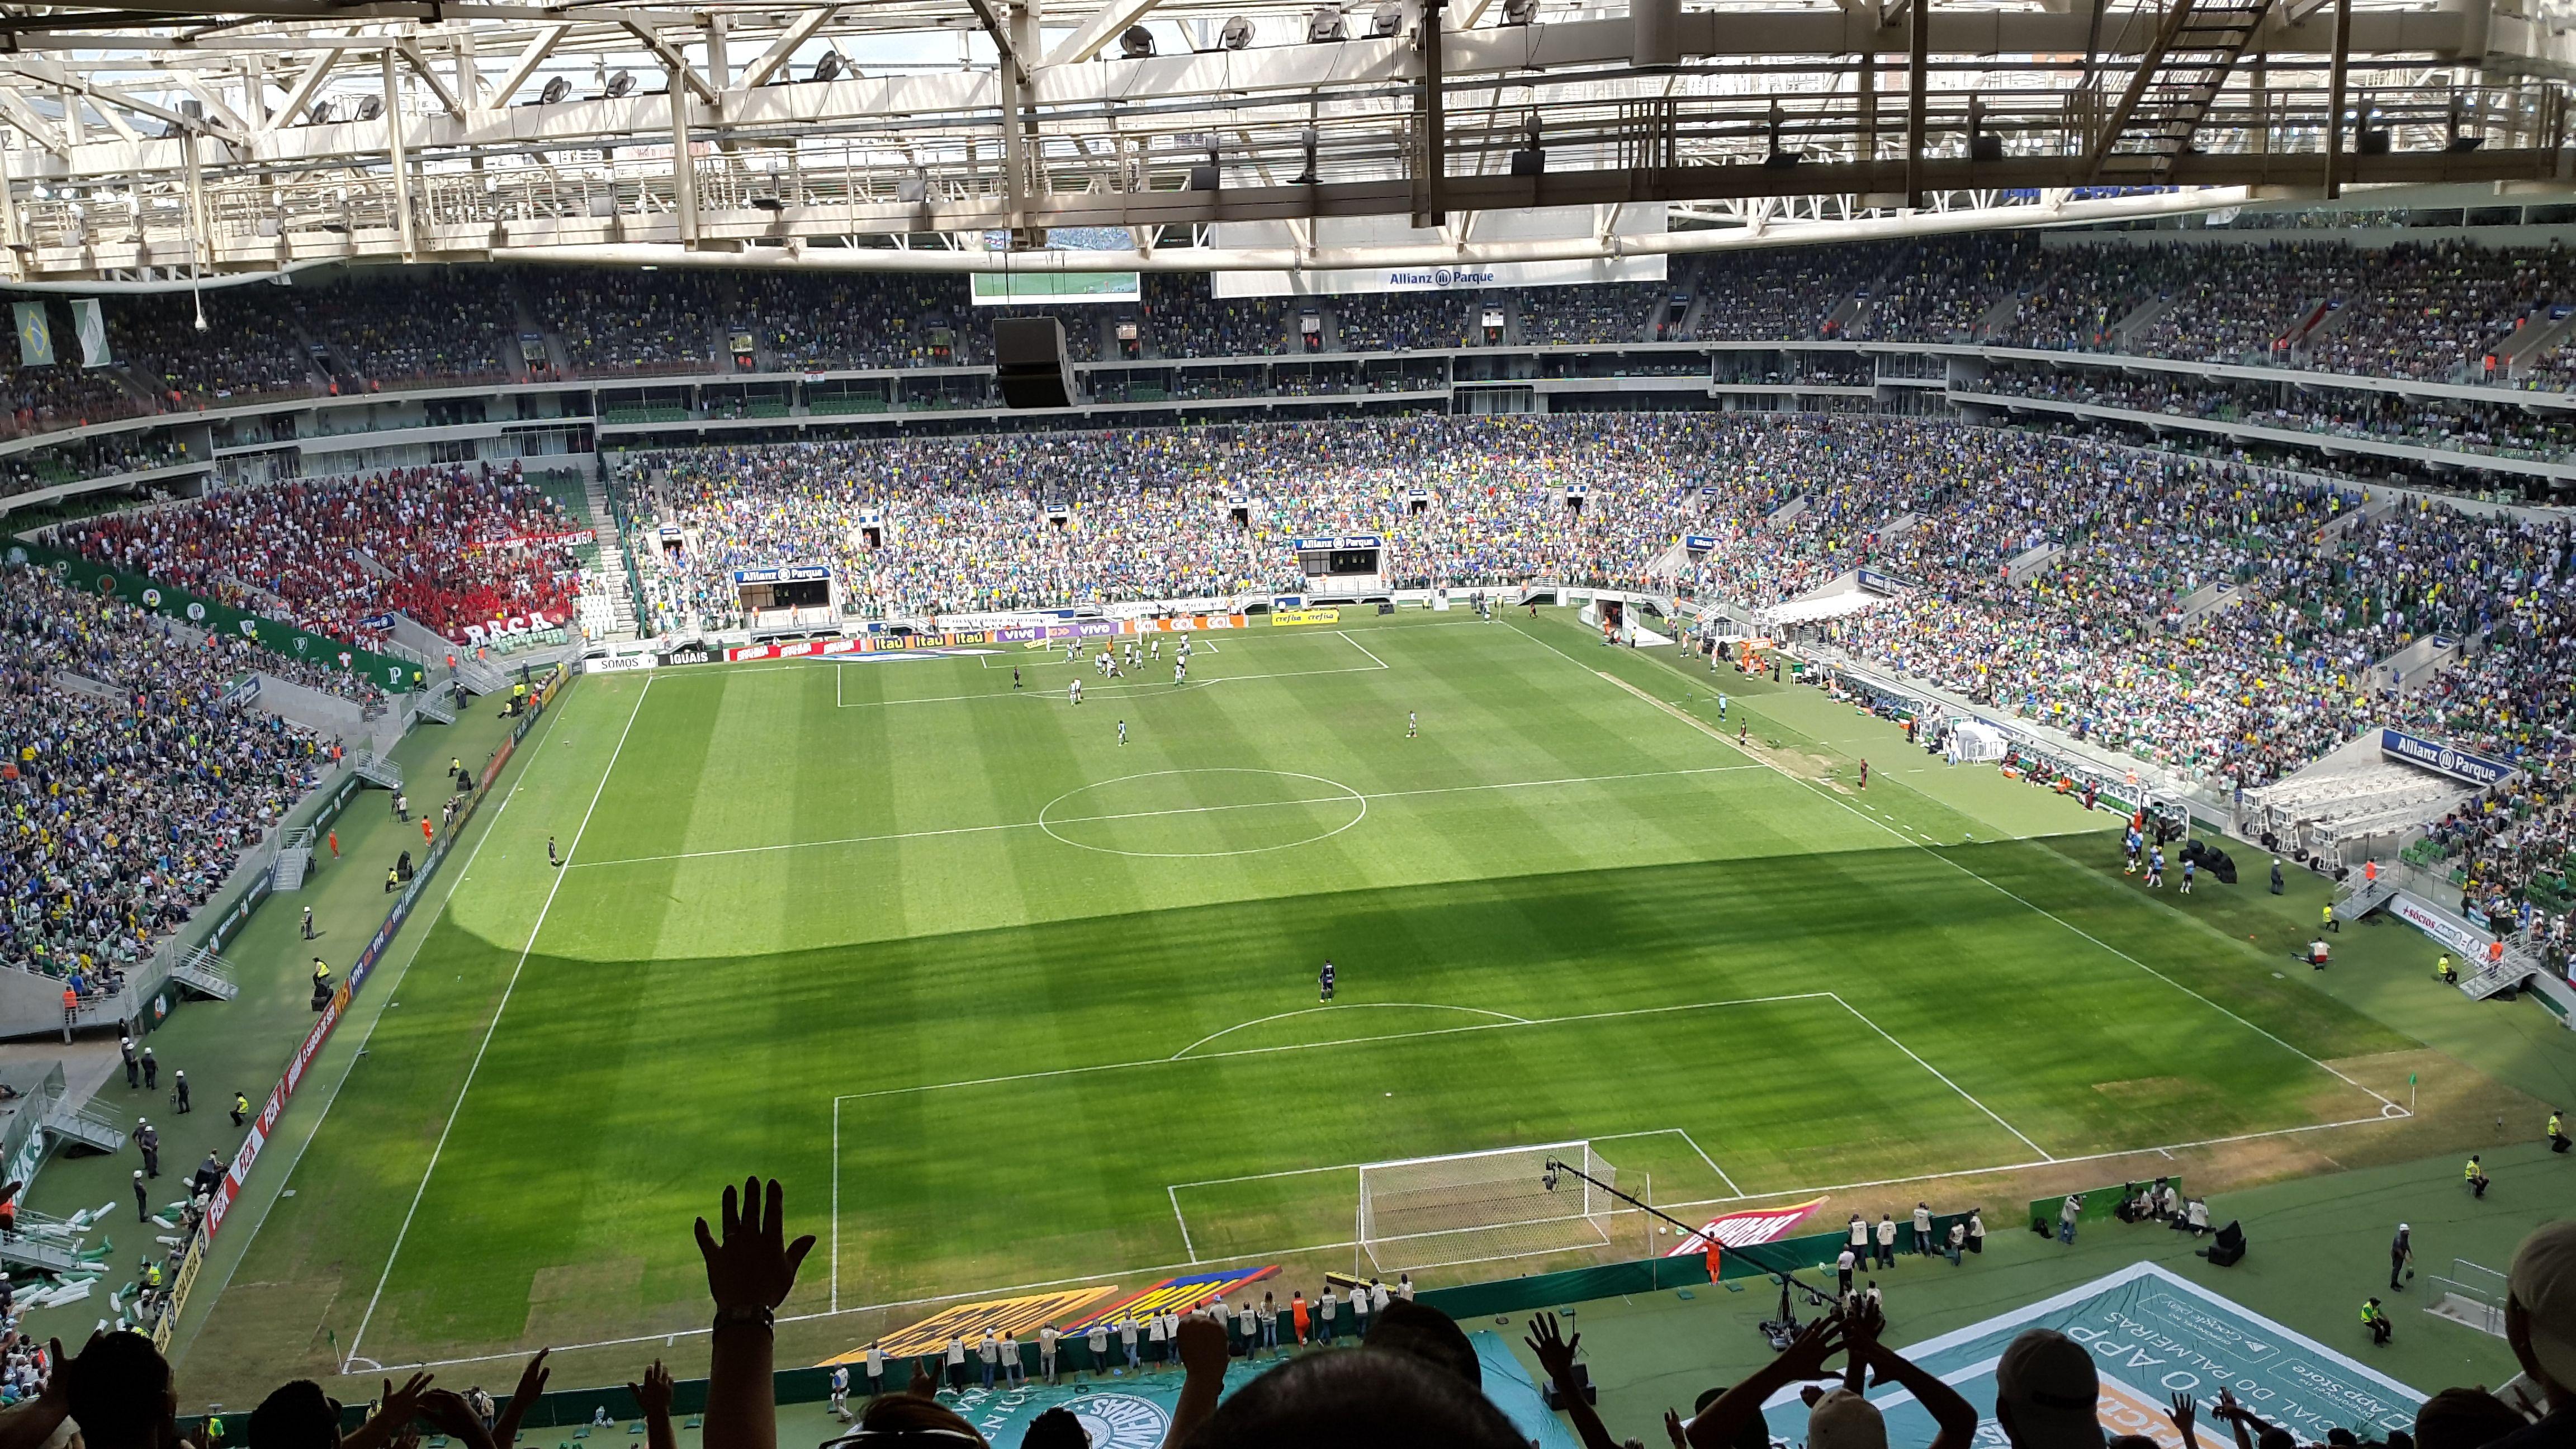 16 August 2015 (1222) / Palmeiras 42 Flamengo Football